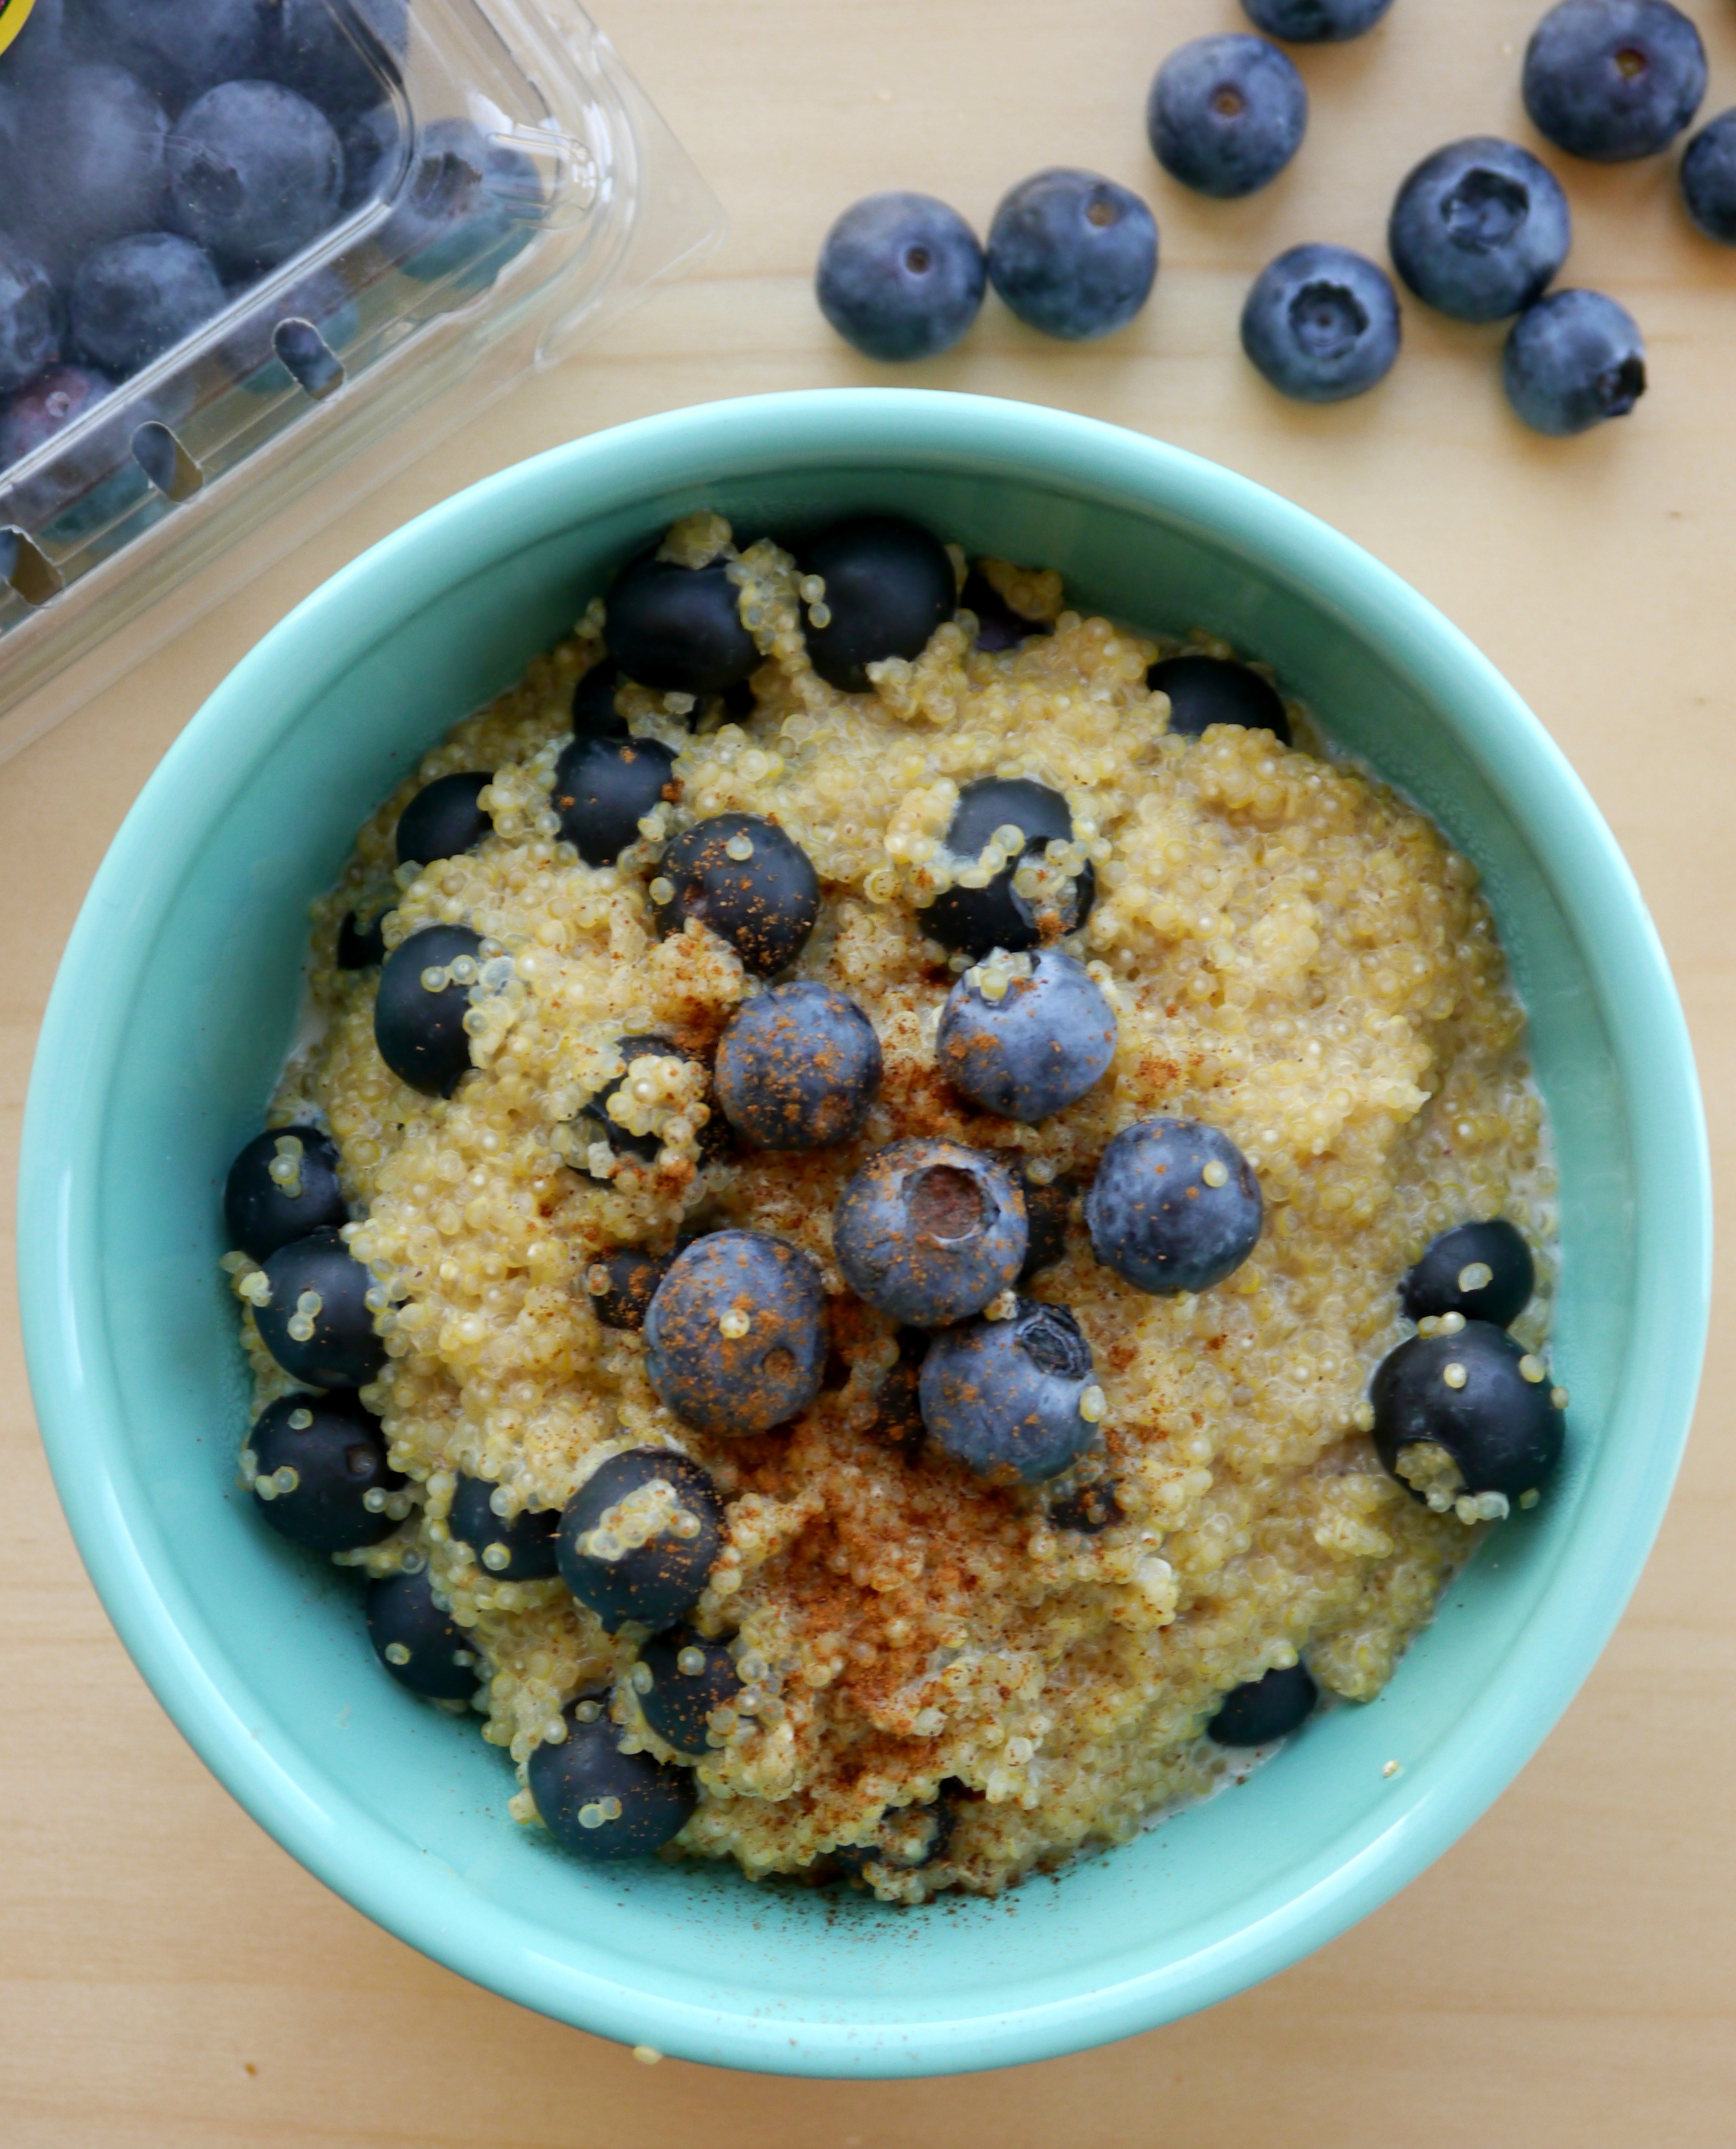 Quinoa For Breakfast  Blueberry Breakfast Quinoa My Bacon Wrapped Life